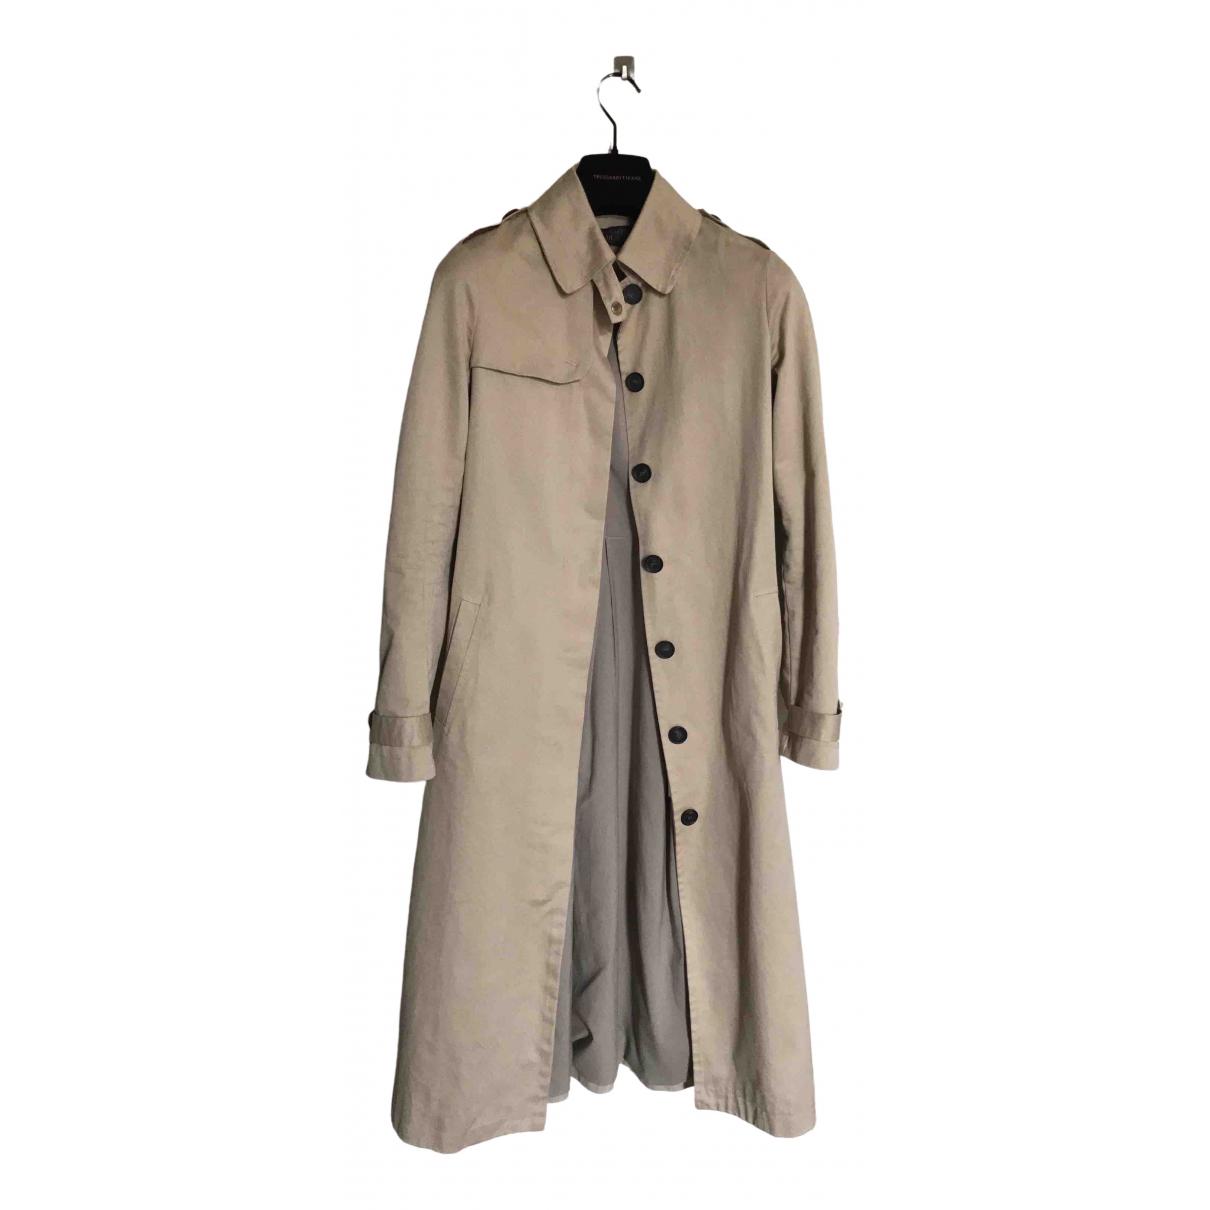 Trussardi Jeans \N Beige Cotton Trench coat for Women 40 IT